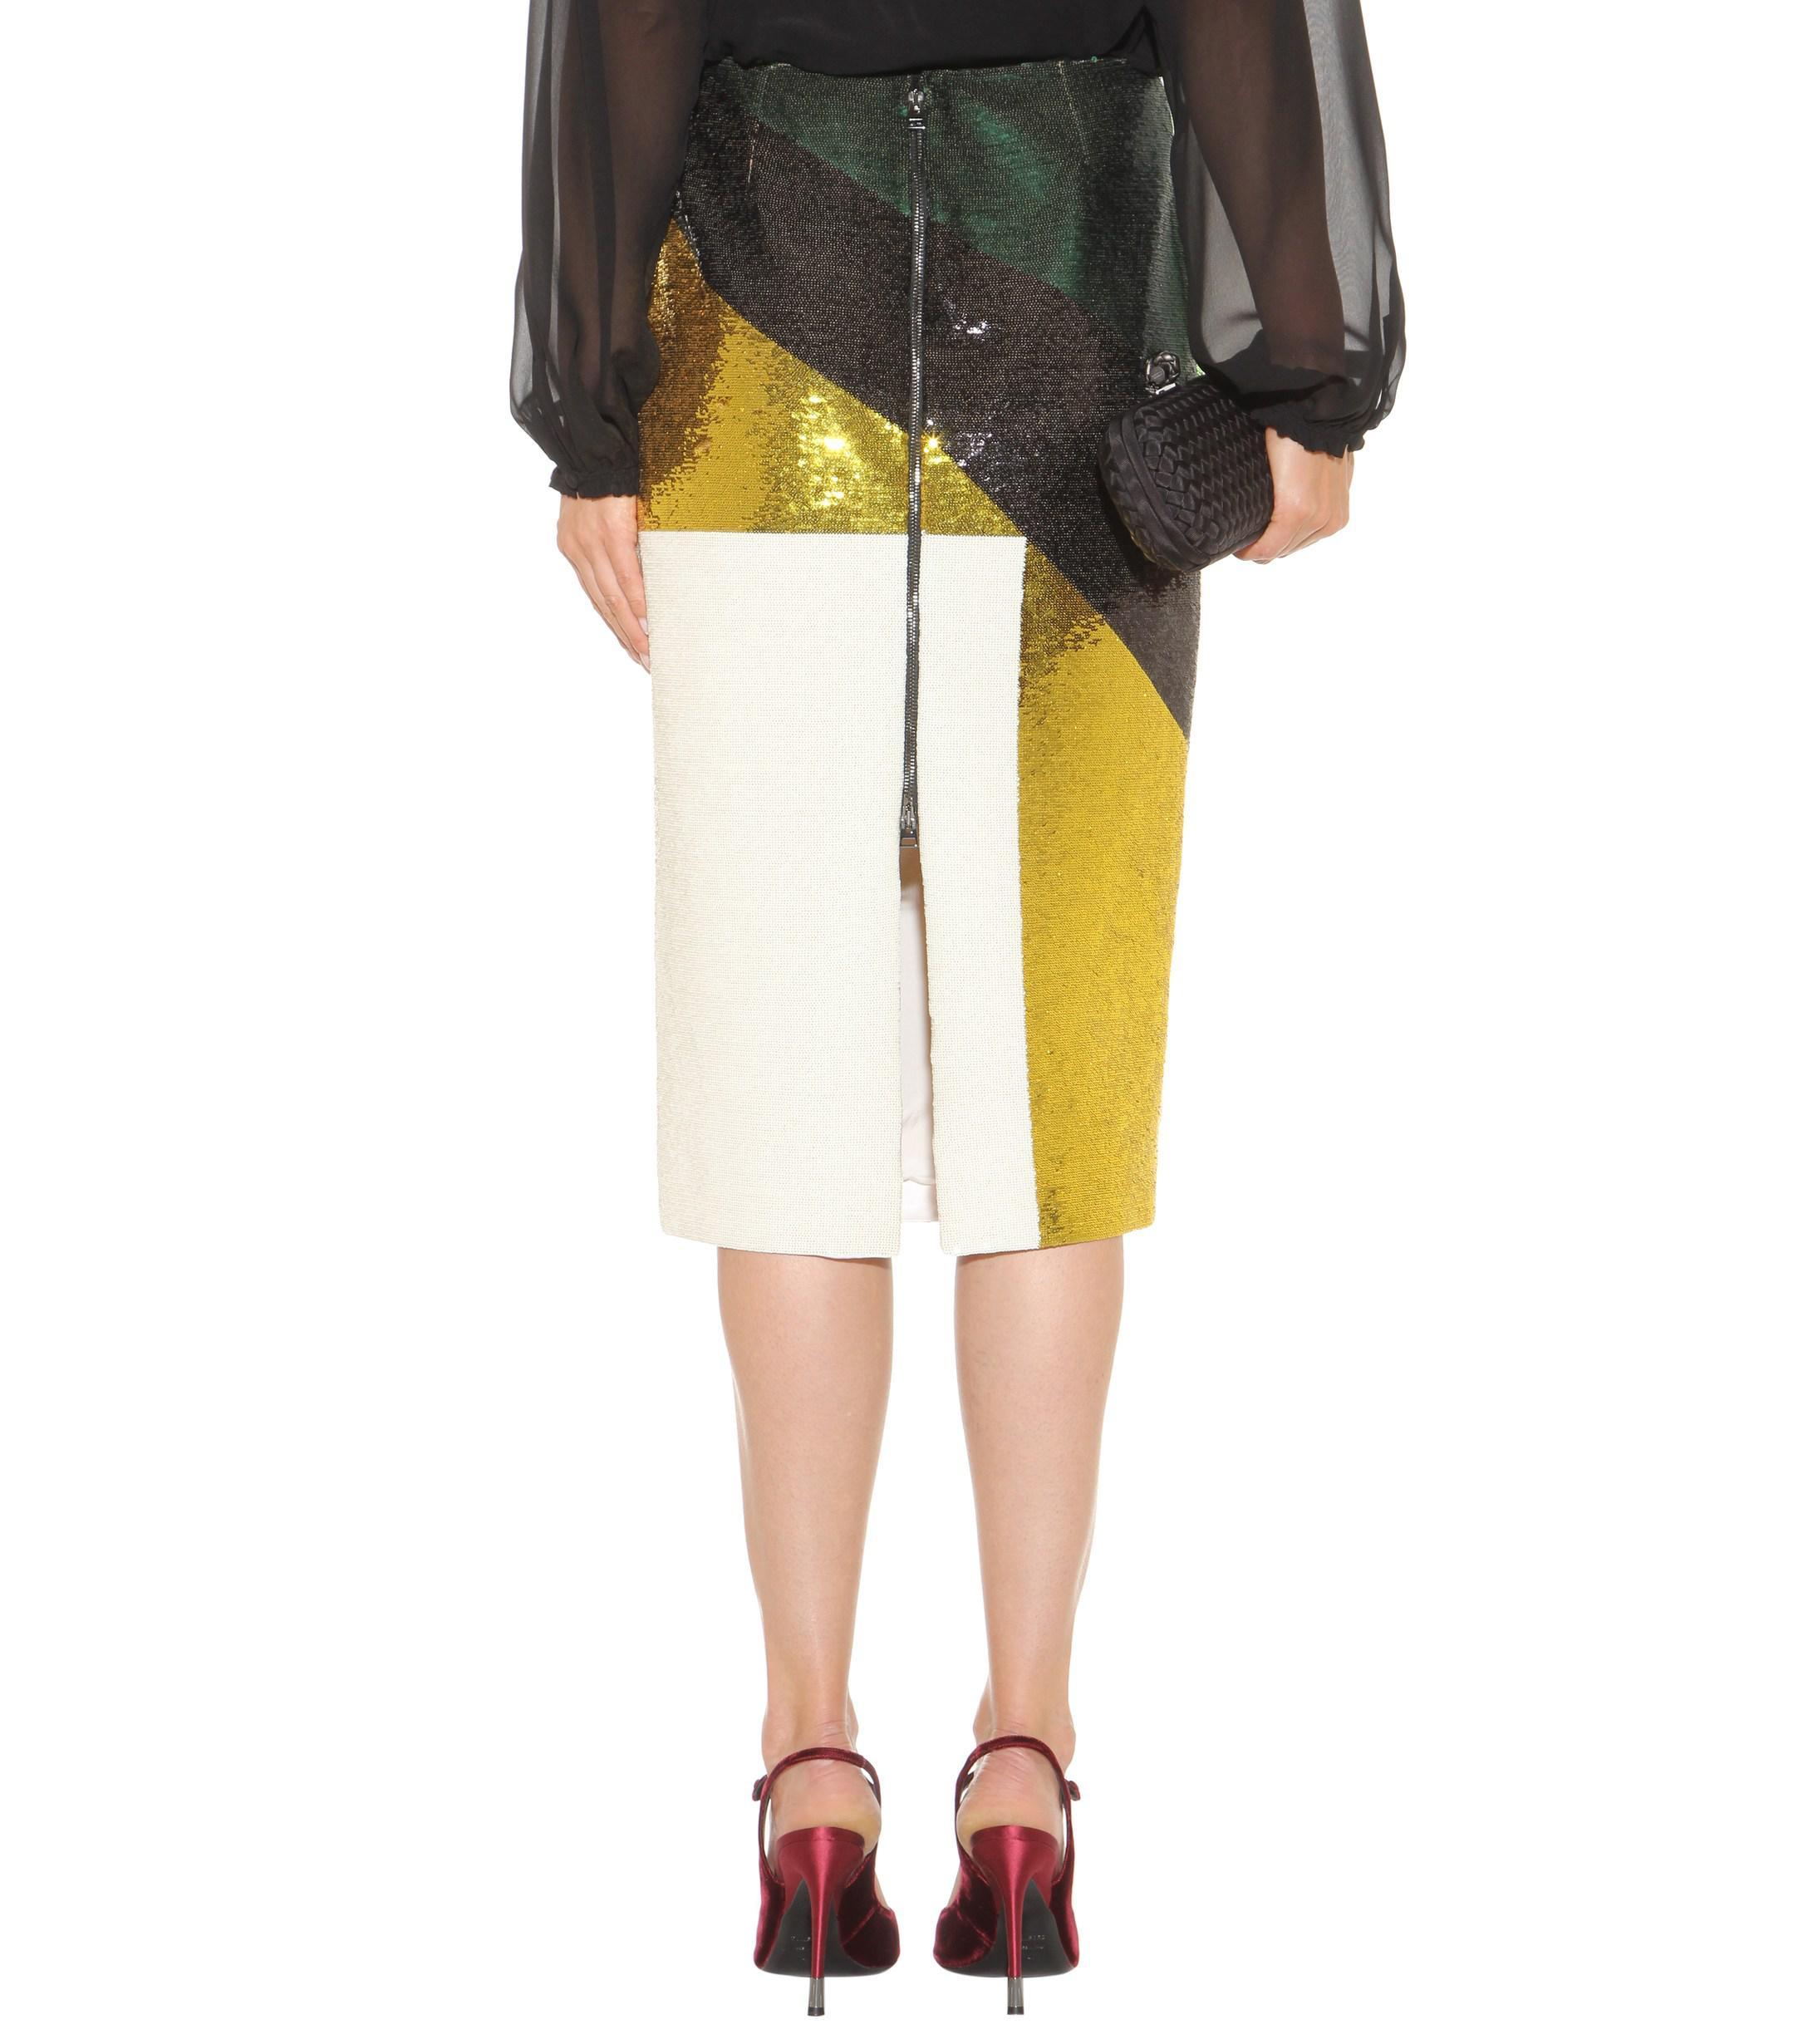 Tom Ford Sequin-embellished Skirt in Green